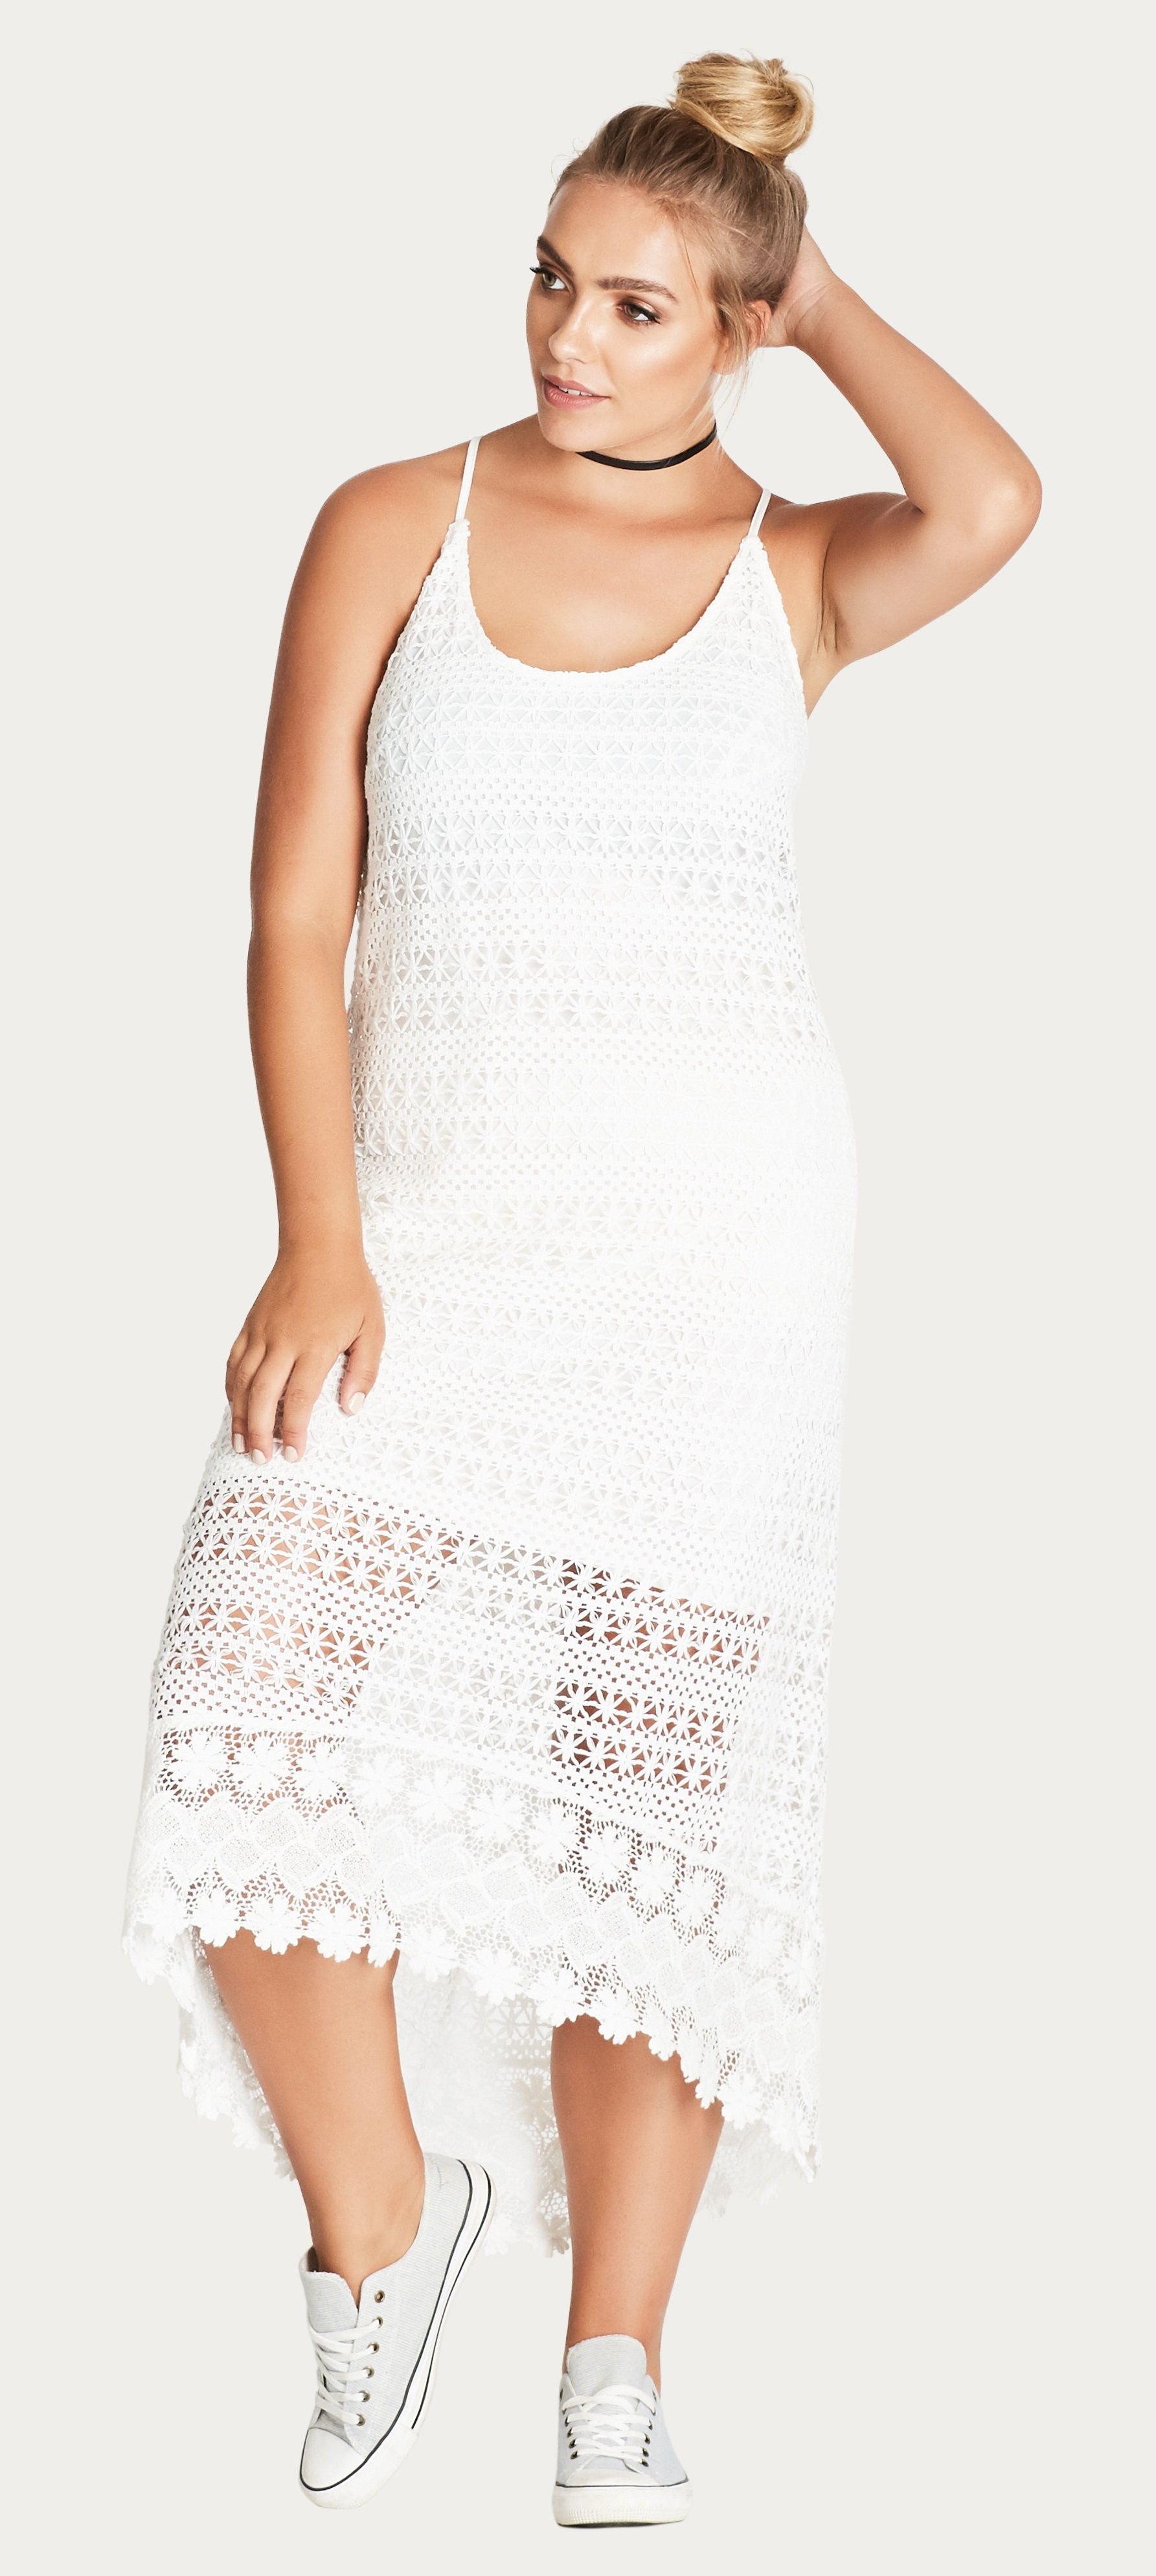 Bbw wedding dresses  Plus Size Crochet Dress  mariage  Pinterest  Tara lynn Moda and